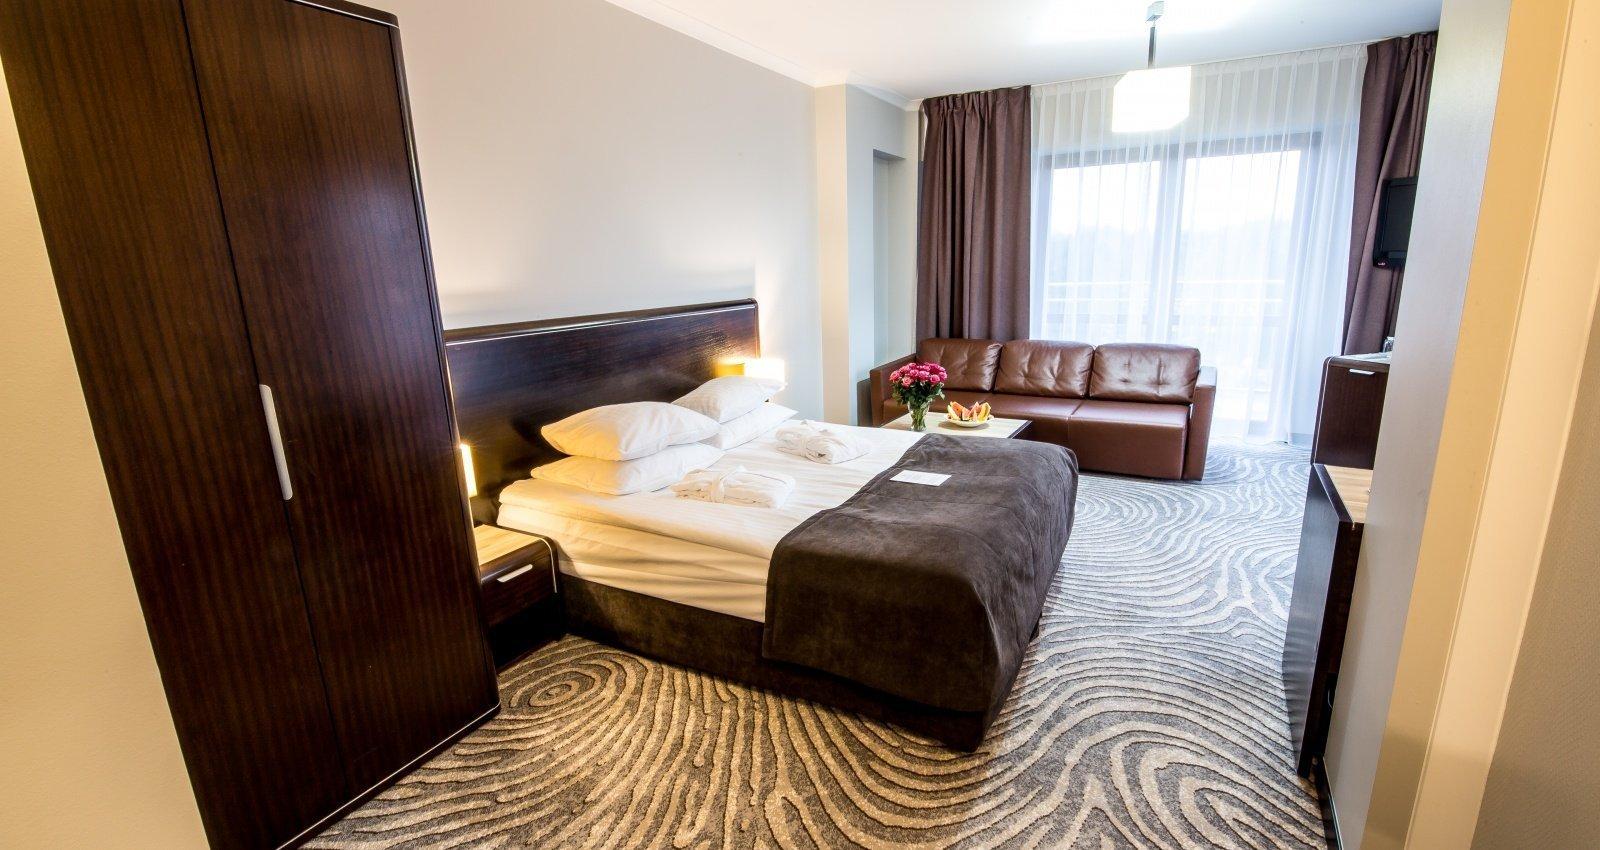 http://u.profitroom.pl/hotelleda.pl/thumb/1600x850/uploads/l102.jpg?size=stretch&mode=crop